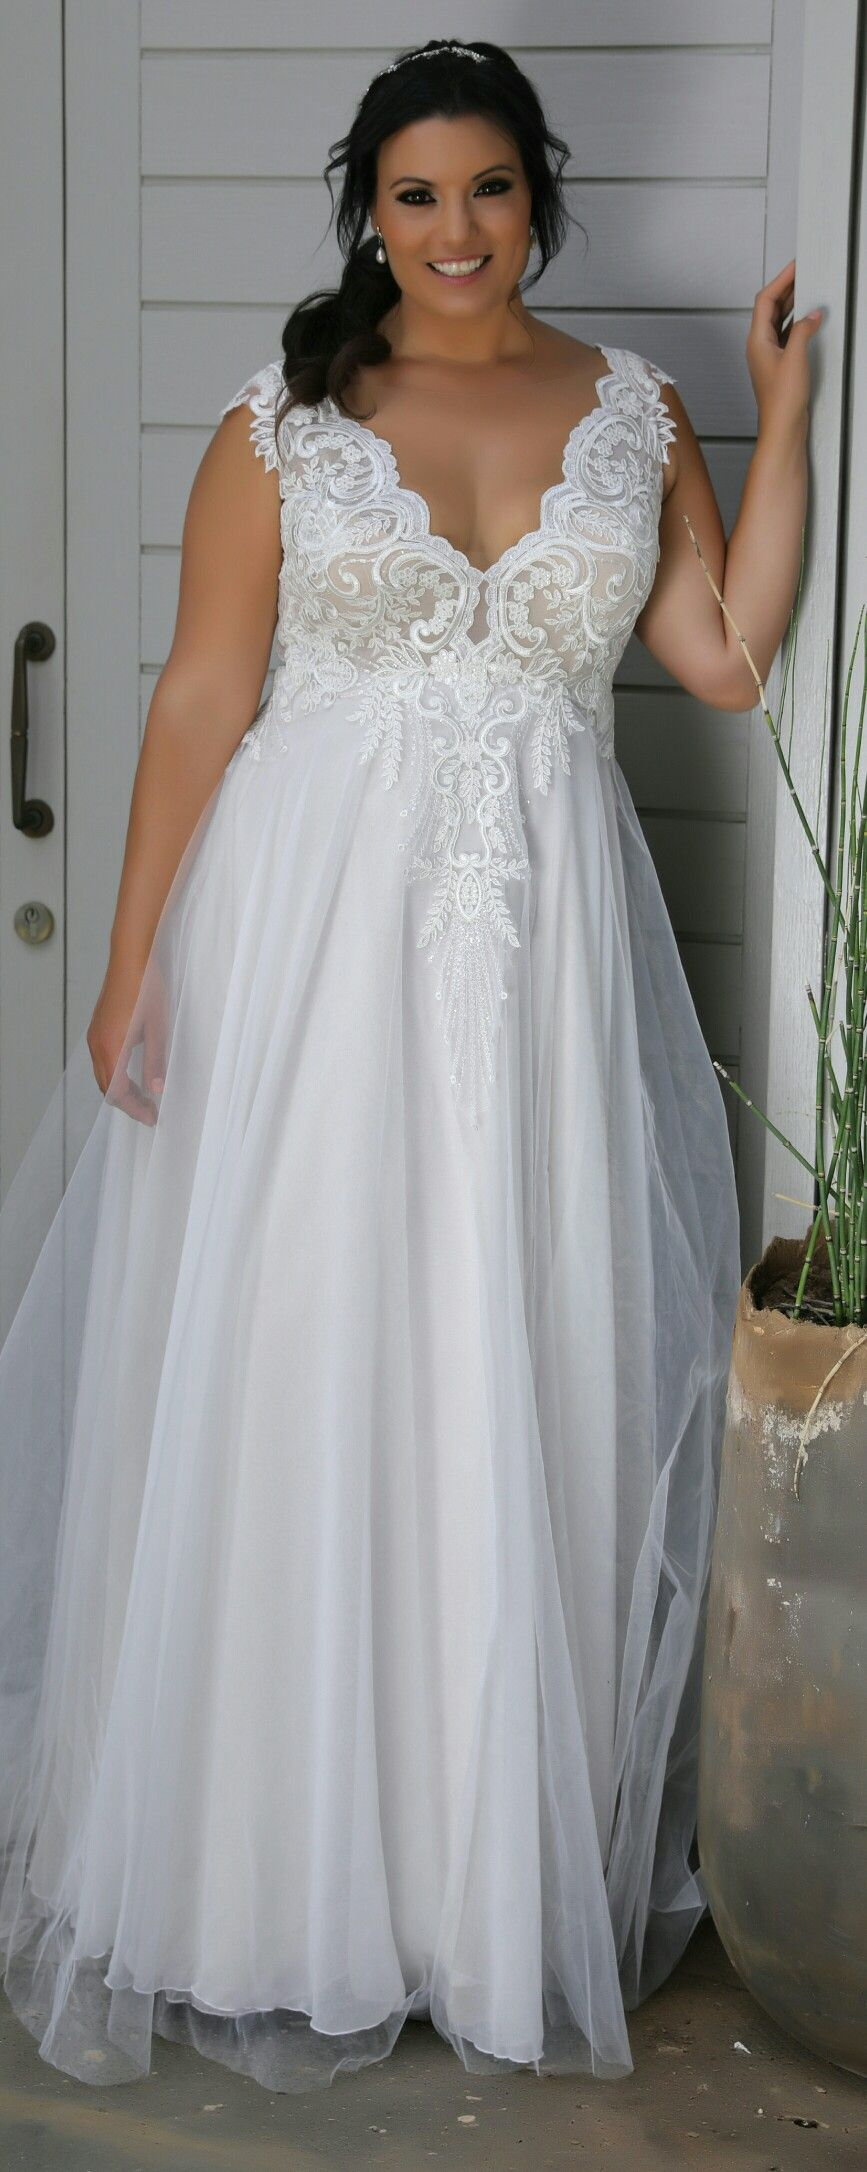 Wedding-Dresses-0737